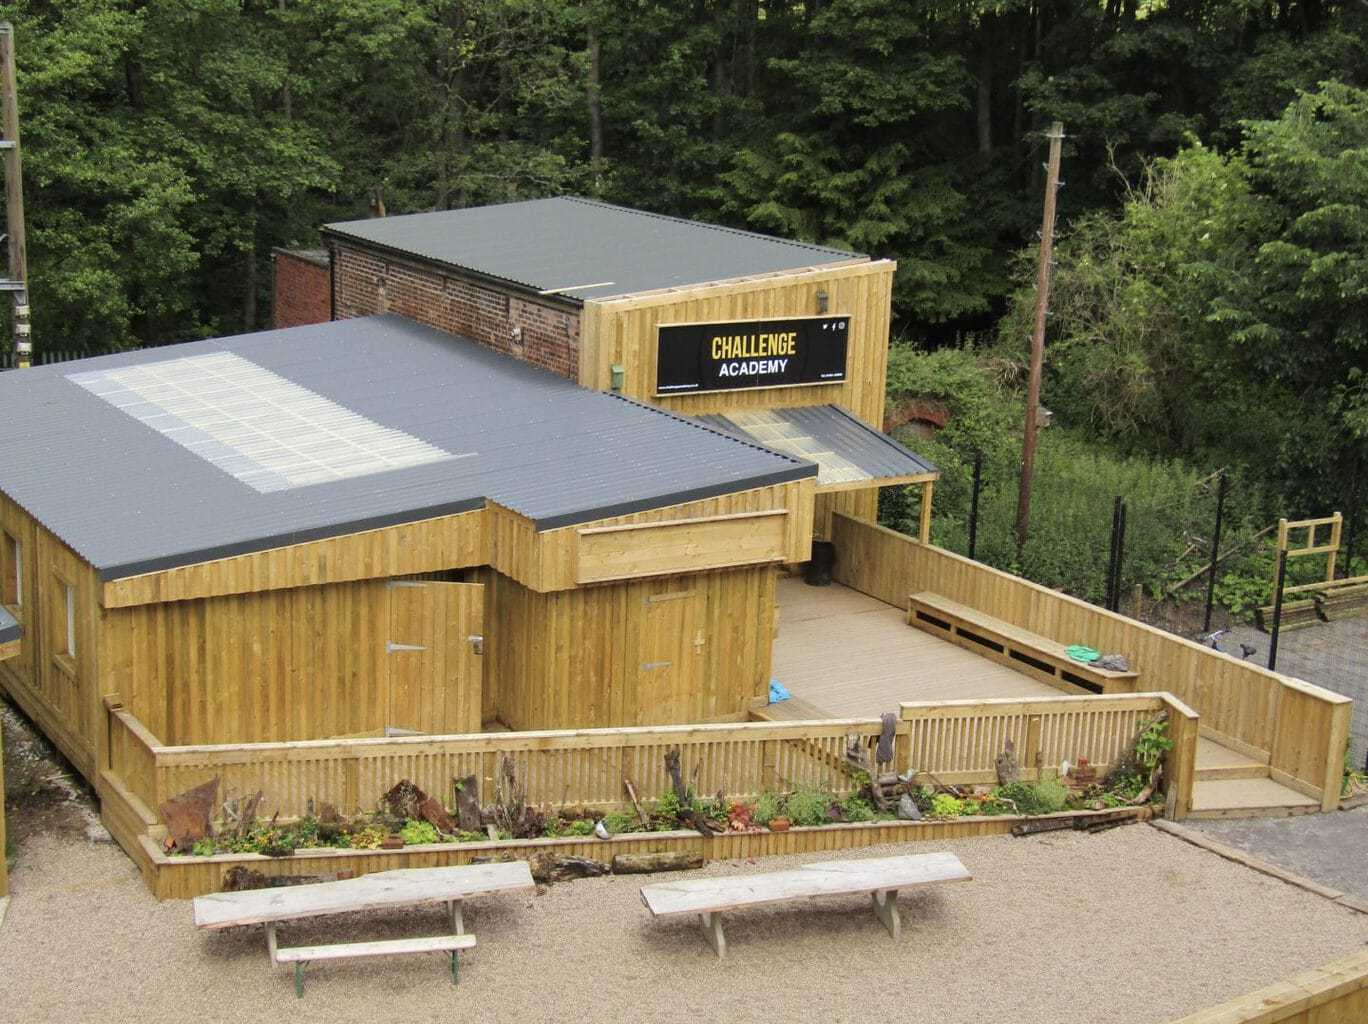 Challenge Academy in Baggeridge Country Park